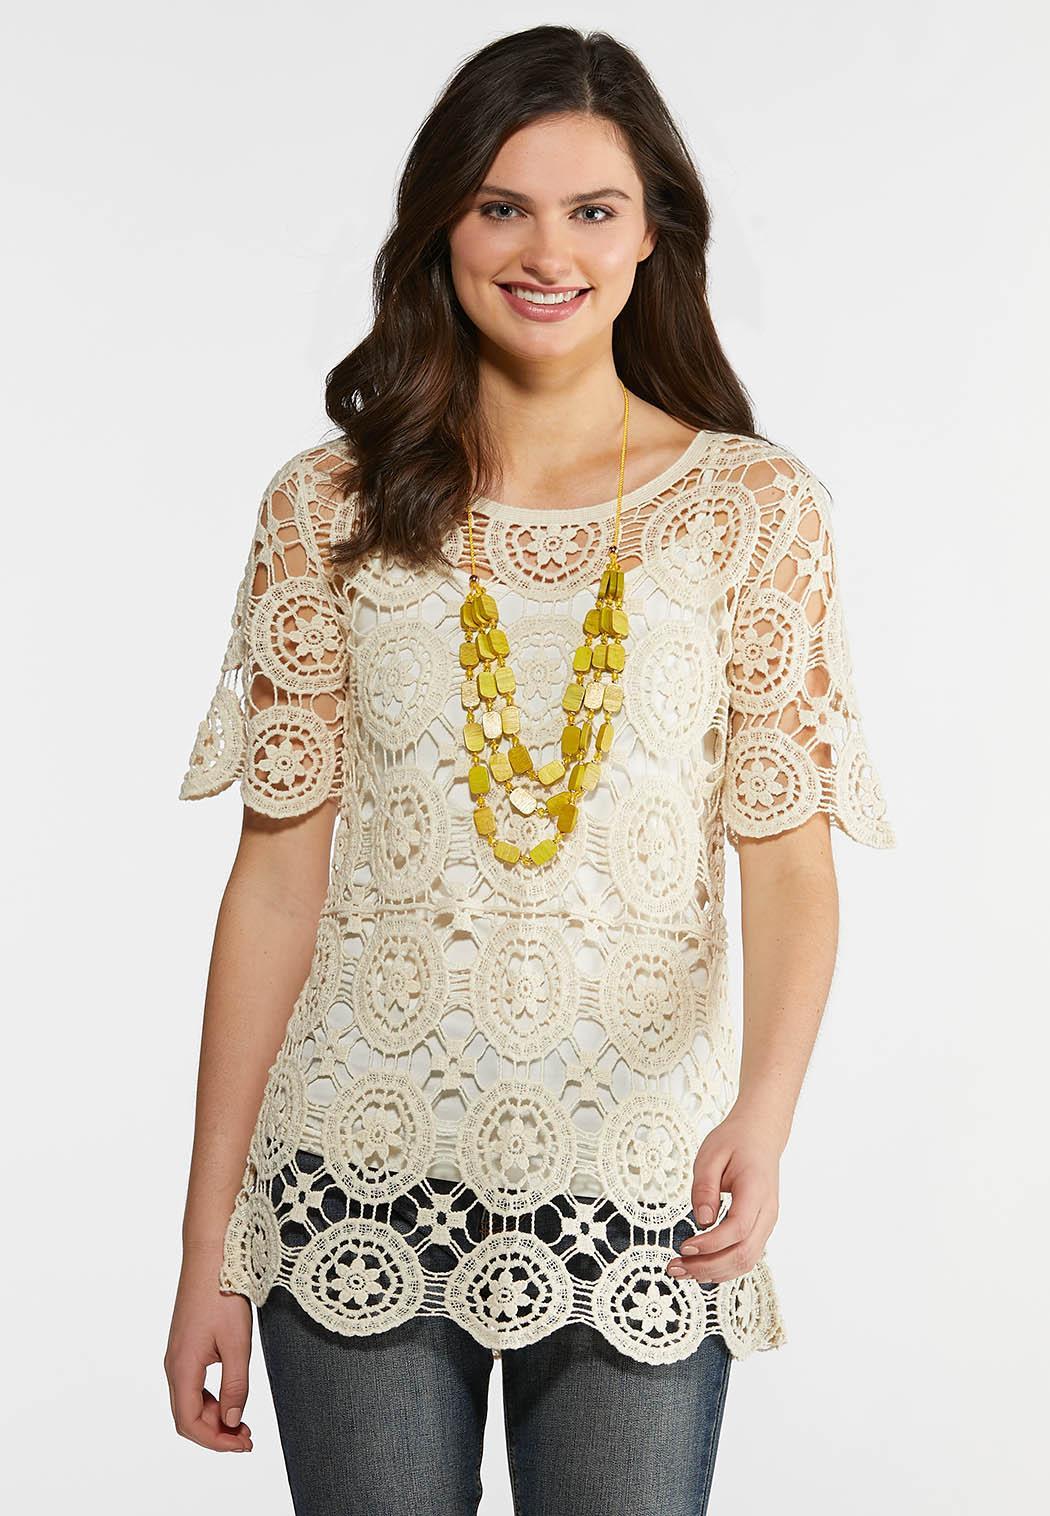 9b6d49e60f3d31 Plus Size Crochet Medallion Top Tops Cato Fashions